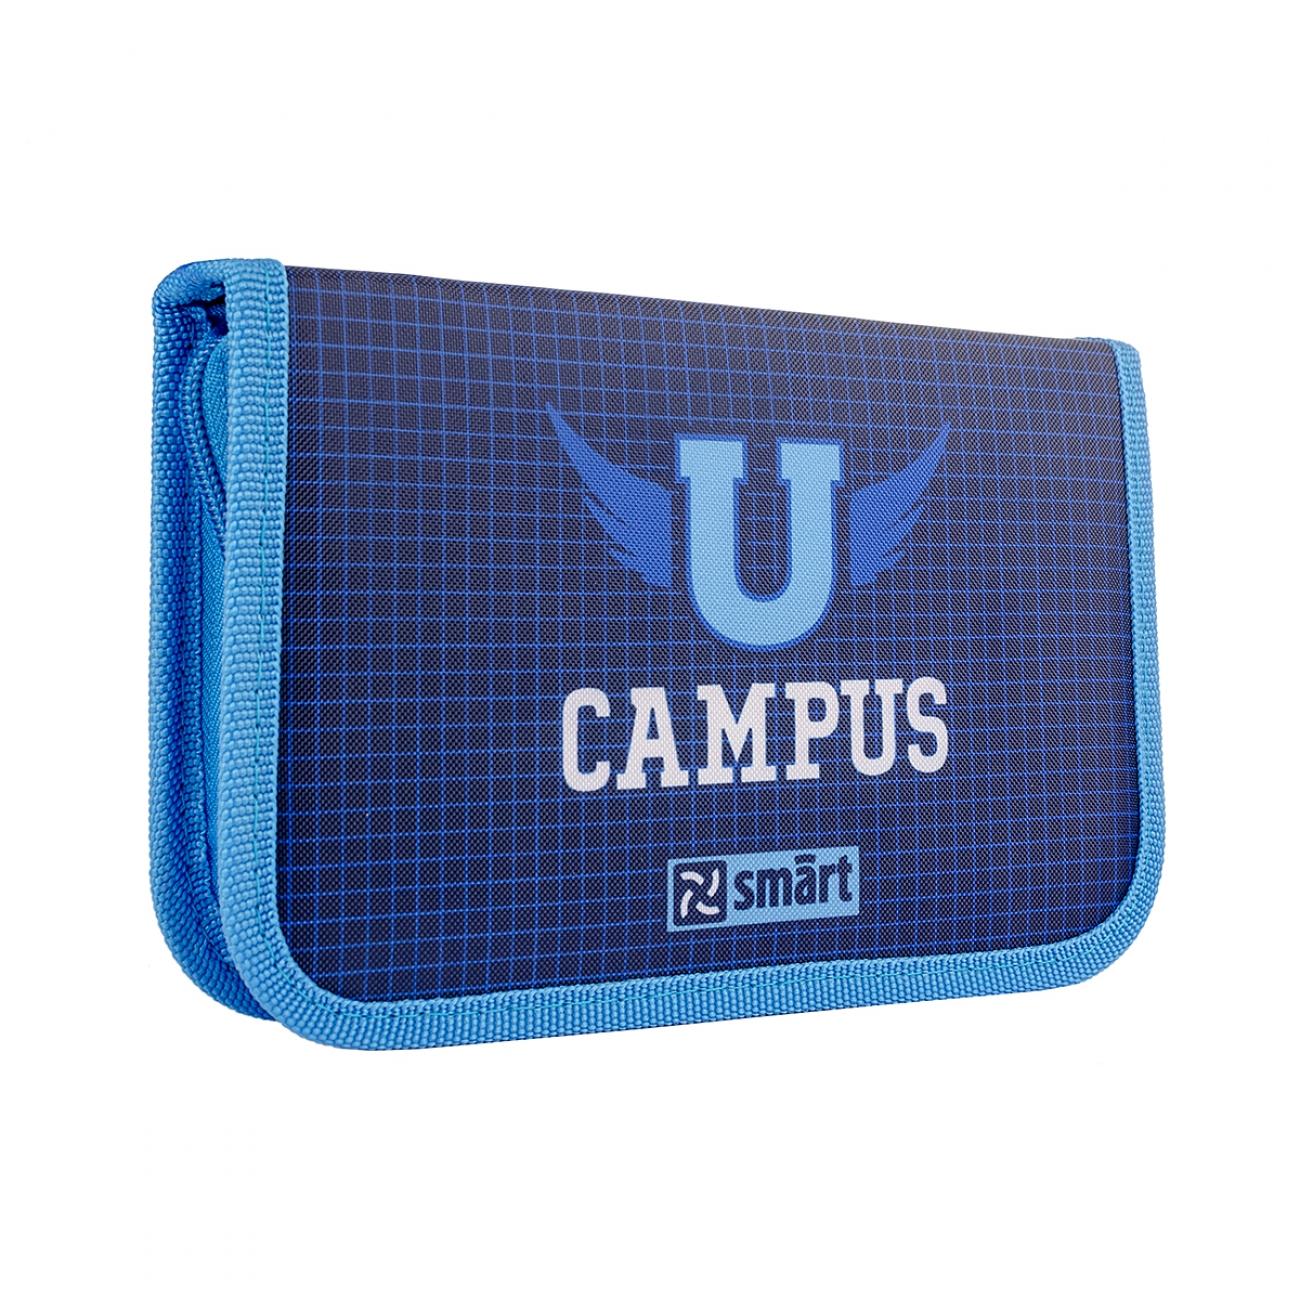 Жесткий пенал  SMART single 20.5x3.2x13  with one flap HP-03 Campus  - 3